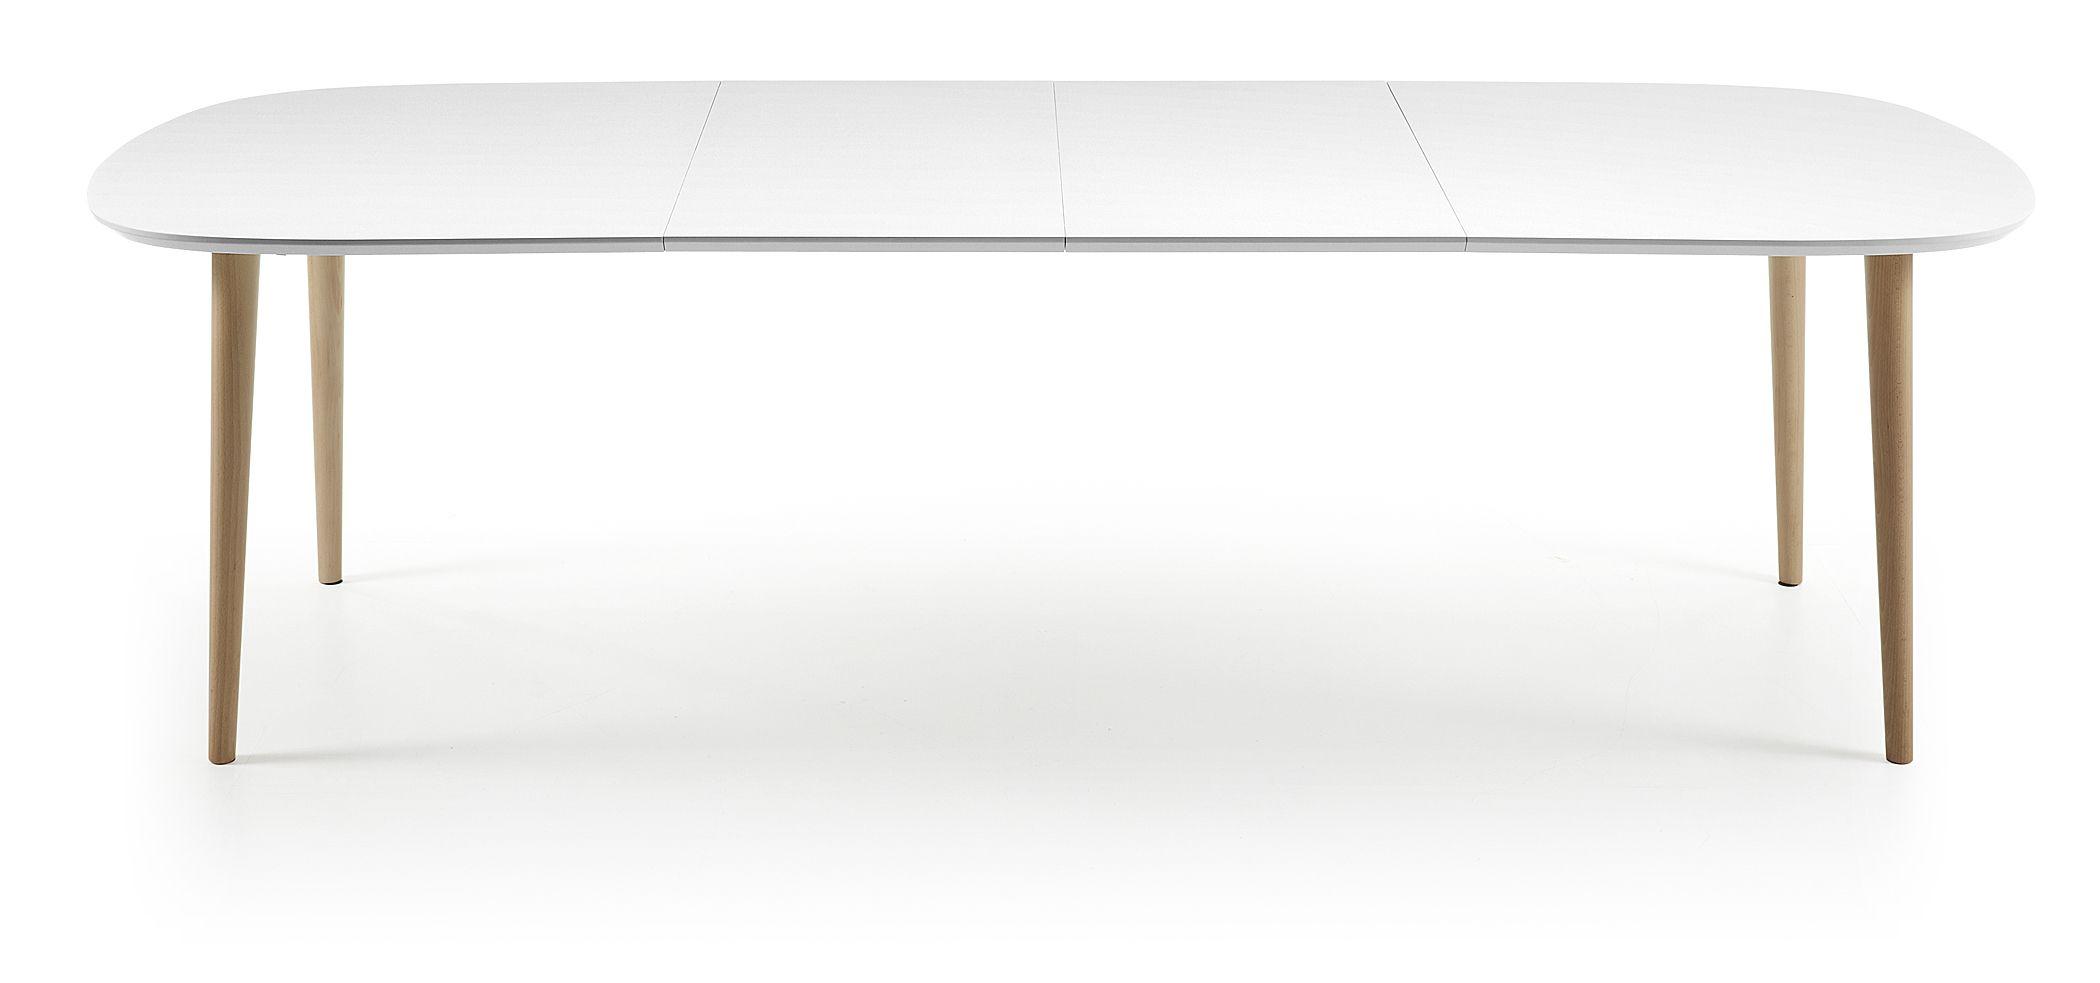 Emejing Table Oqui Extensible Contemporary - Transformatorio.us ...